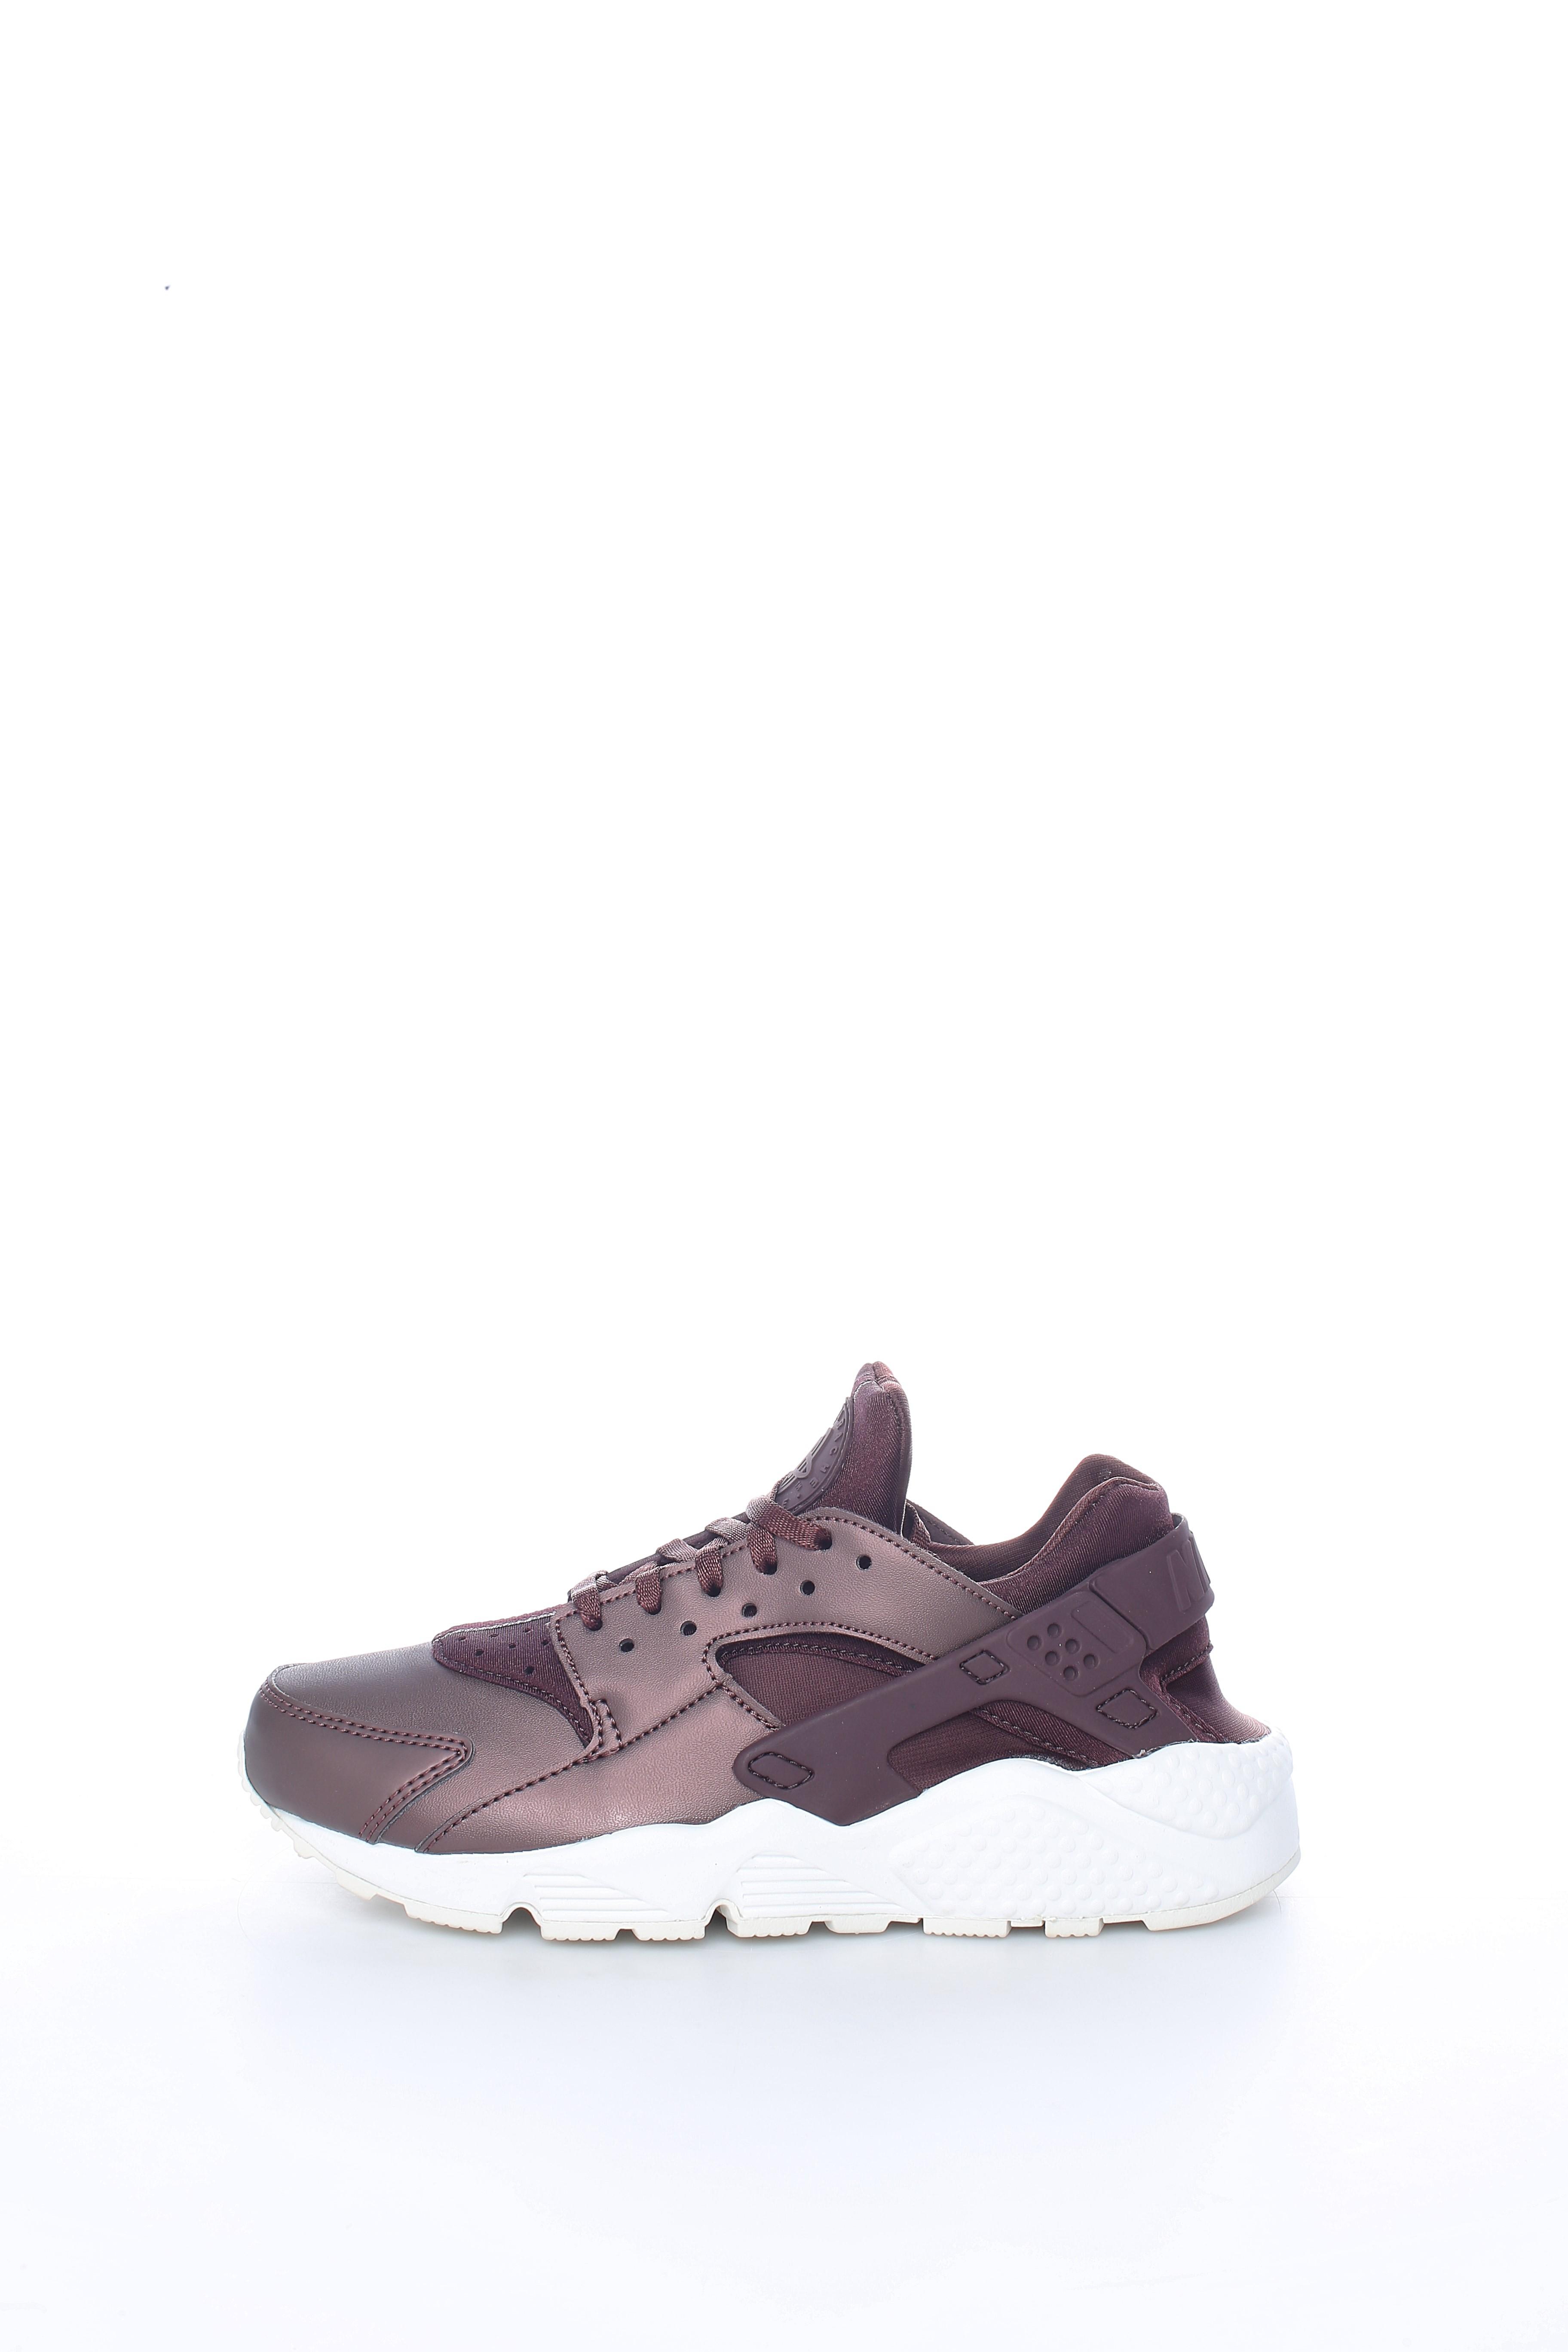 NIKE - Γυναικεία παπούτσια AIR HUARACHE RUN PRM μπορντό